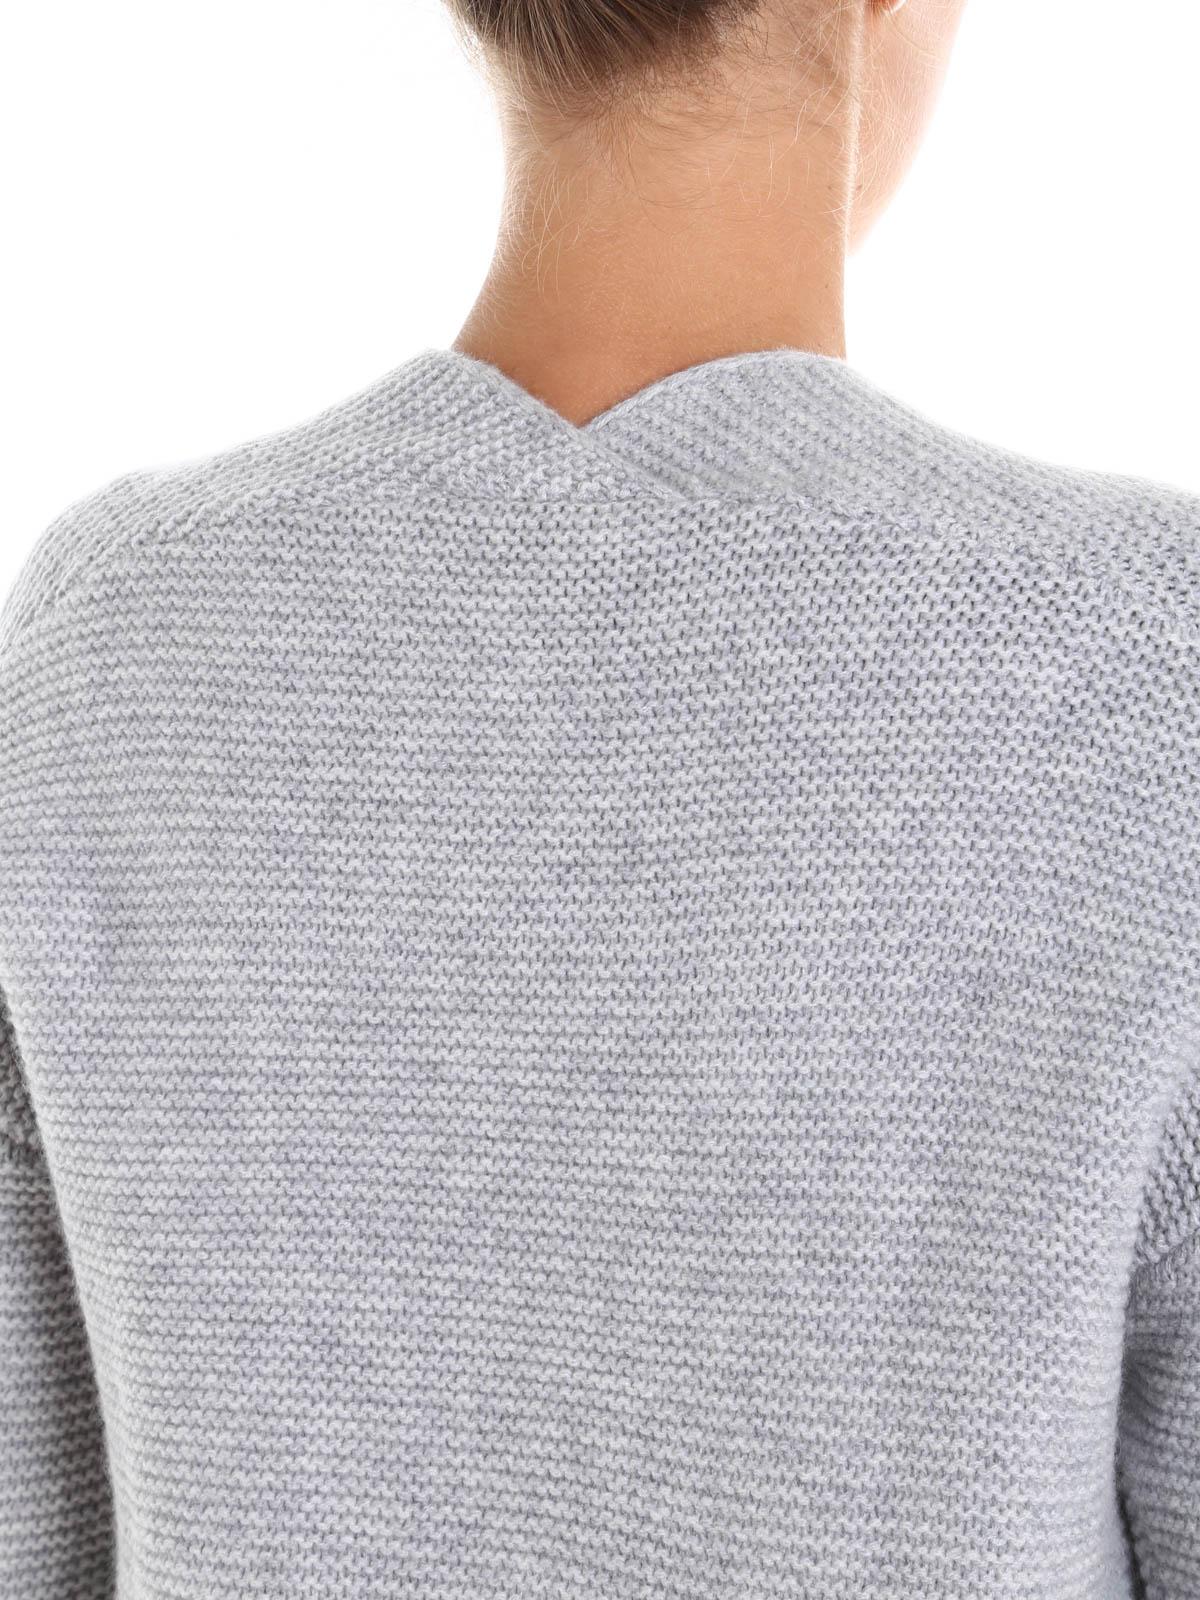 Wool and cashmere sweater by Hemisphere - v necks | iKRIX